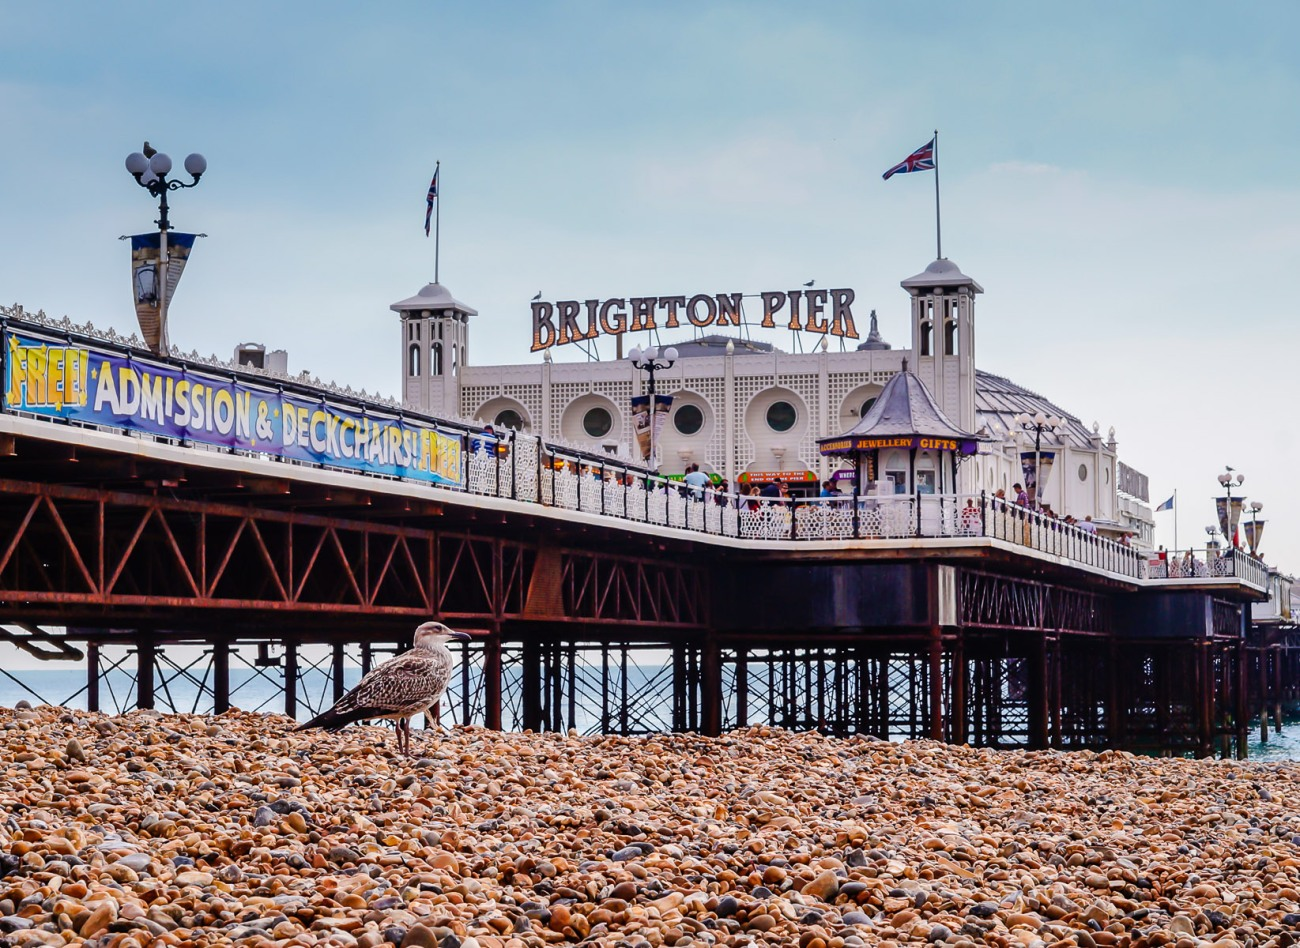 Beverley Goodwin - Brighton Pier